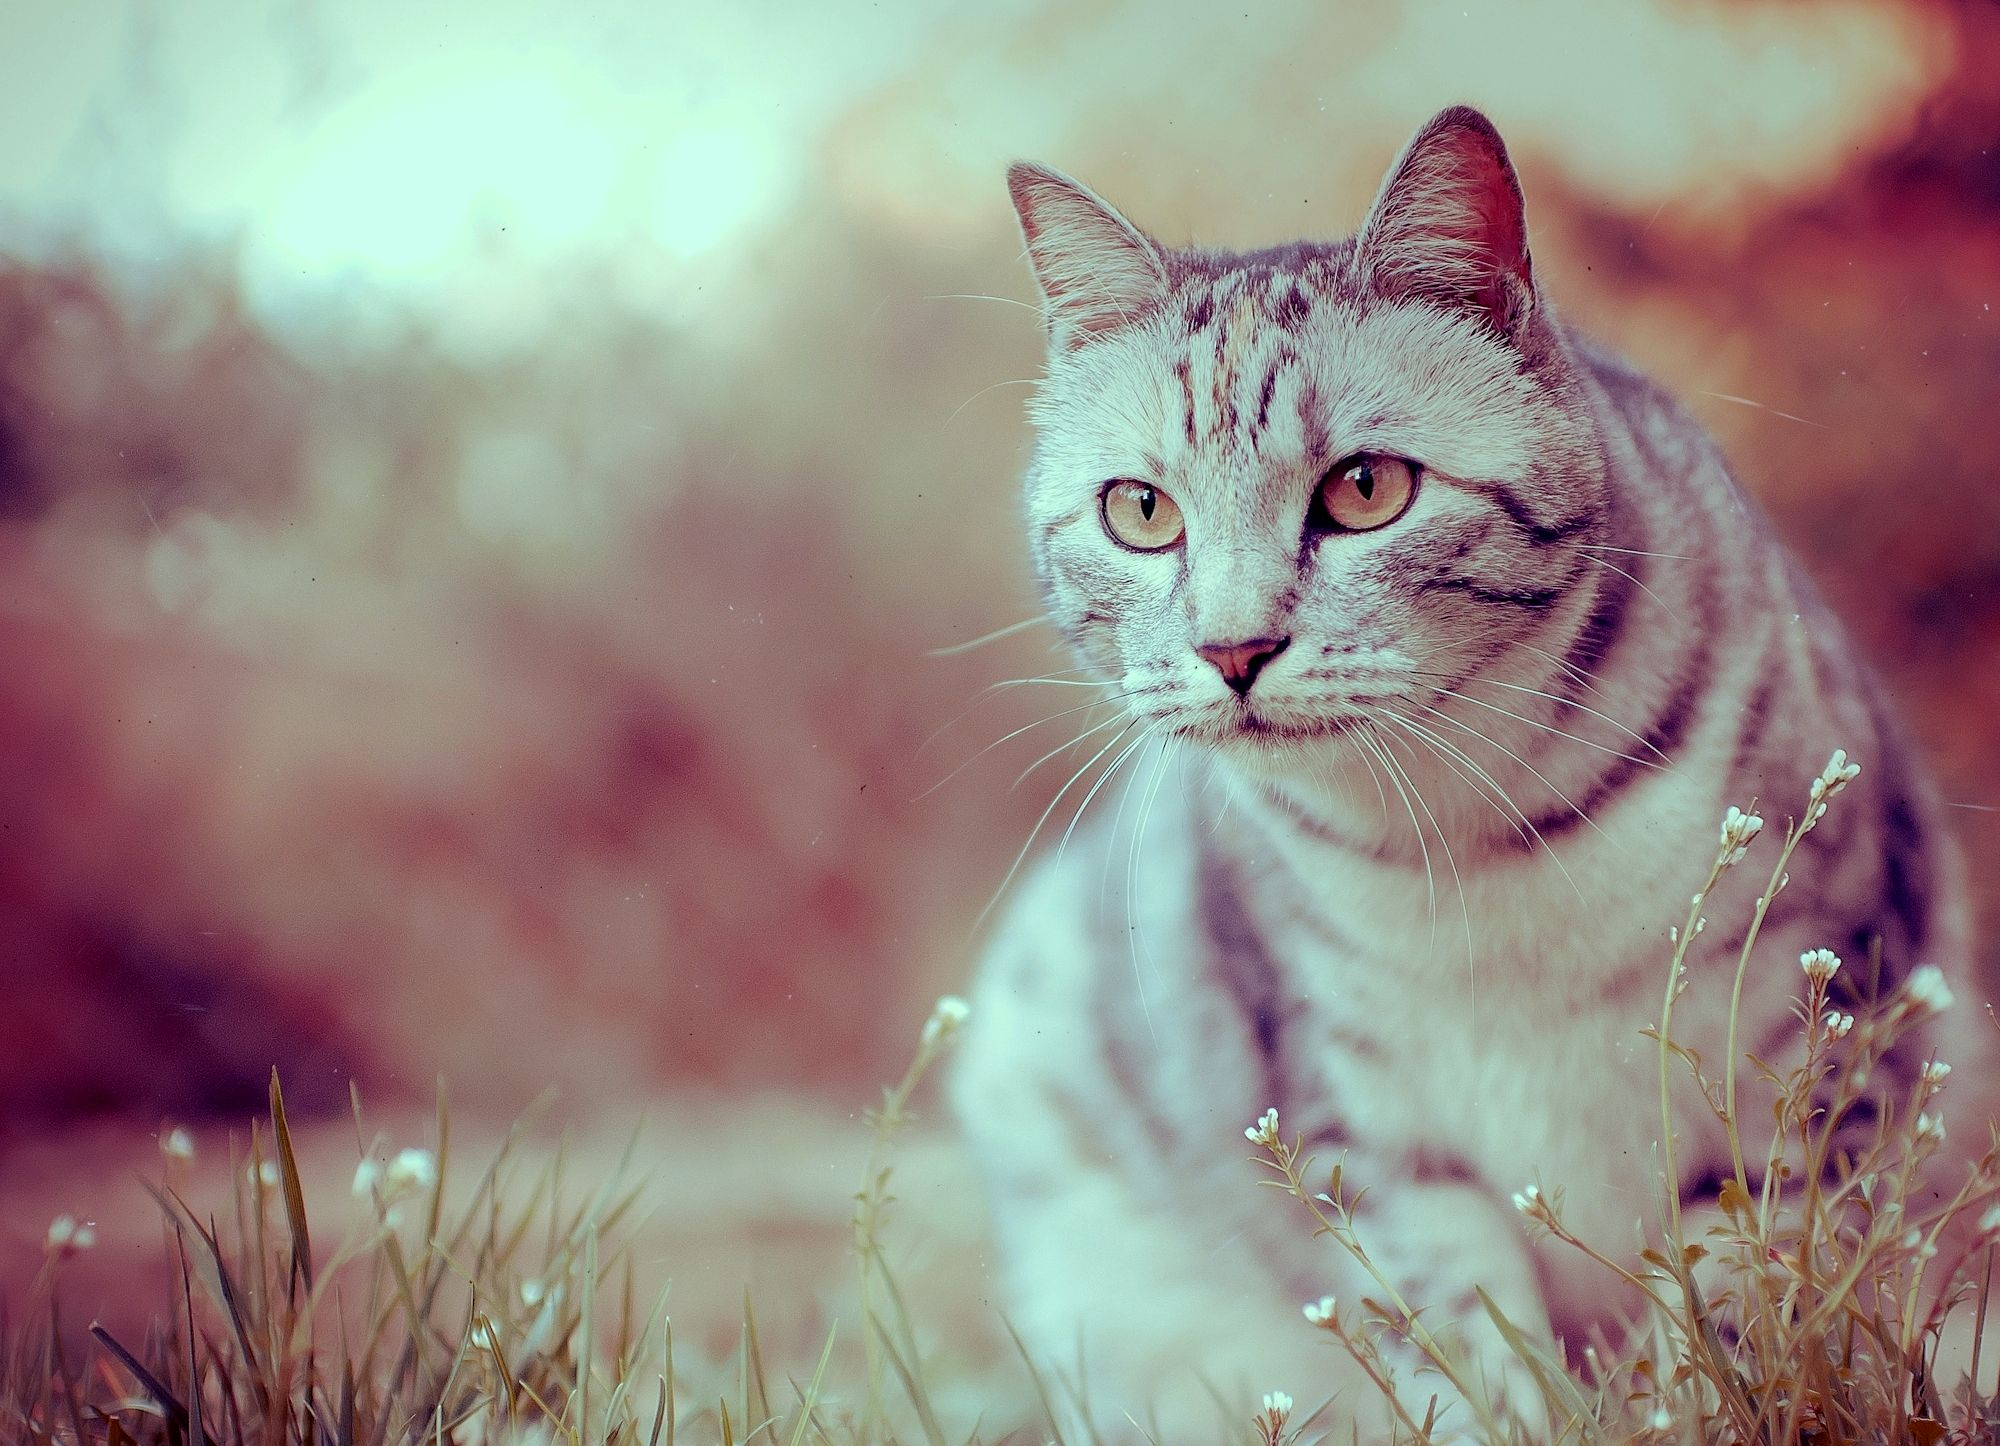 милый котенок мордочка камень трава бесплатно